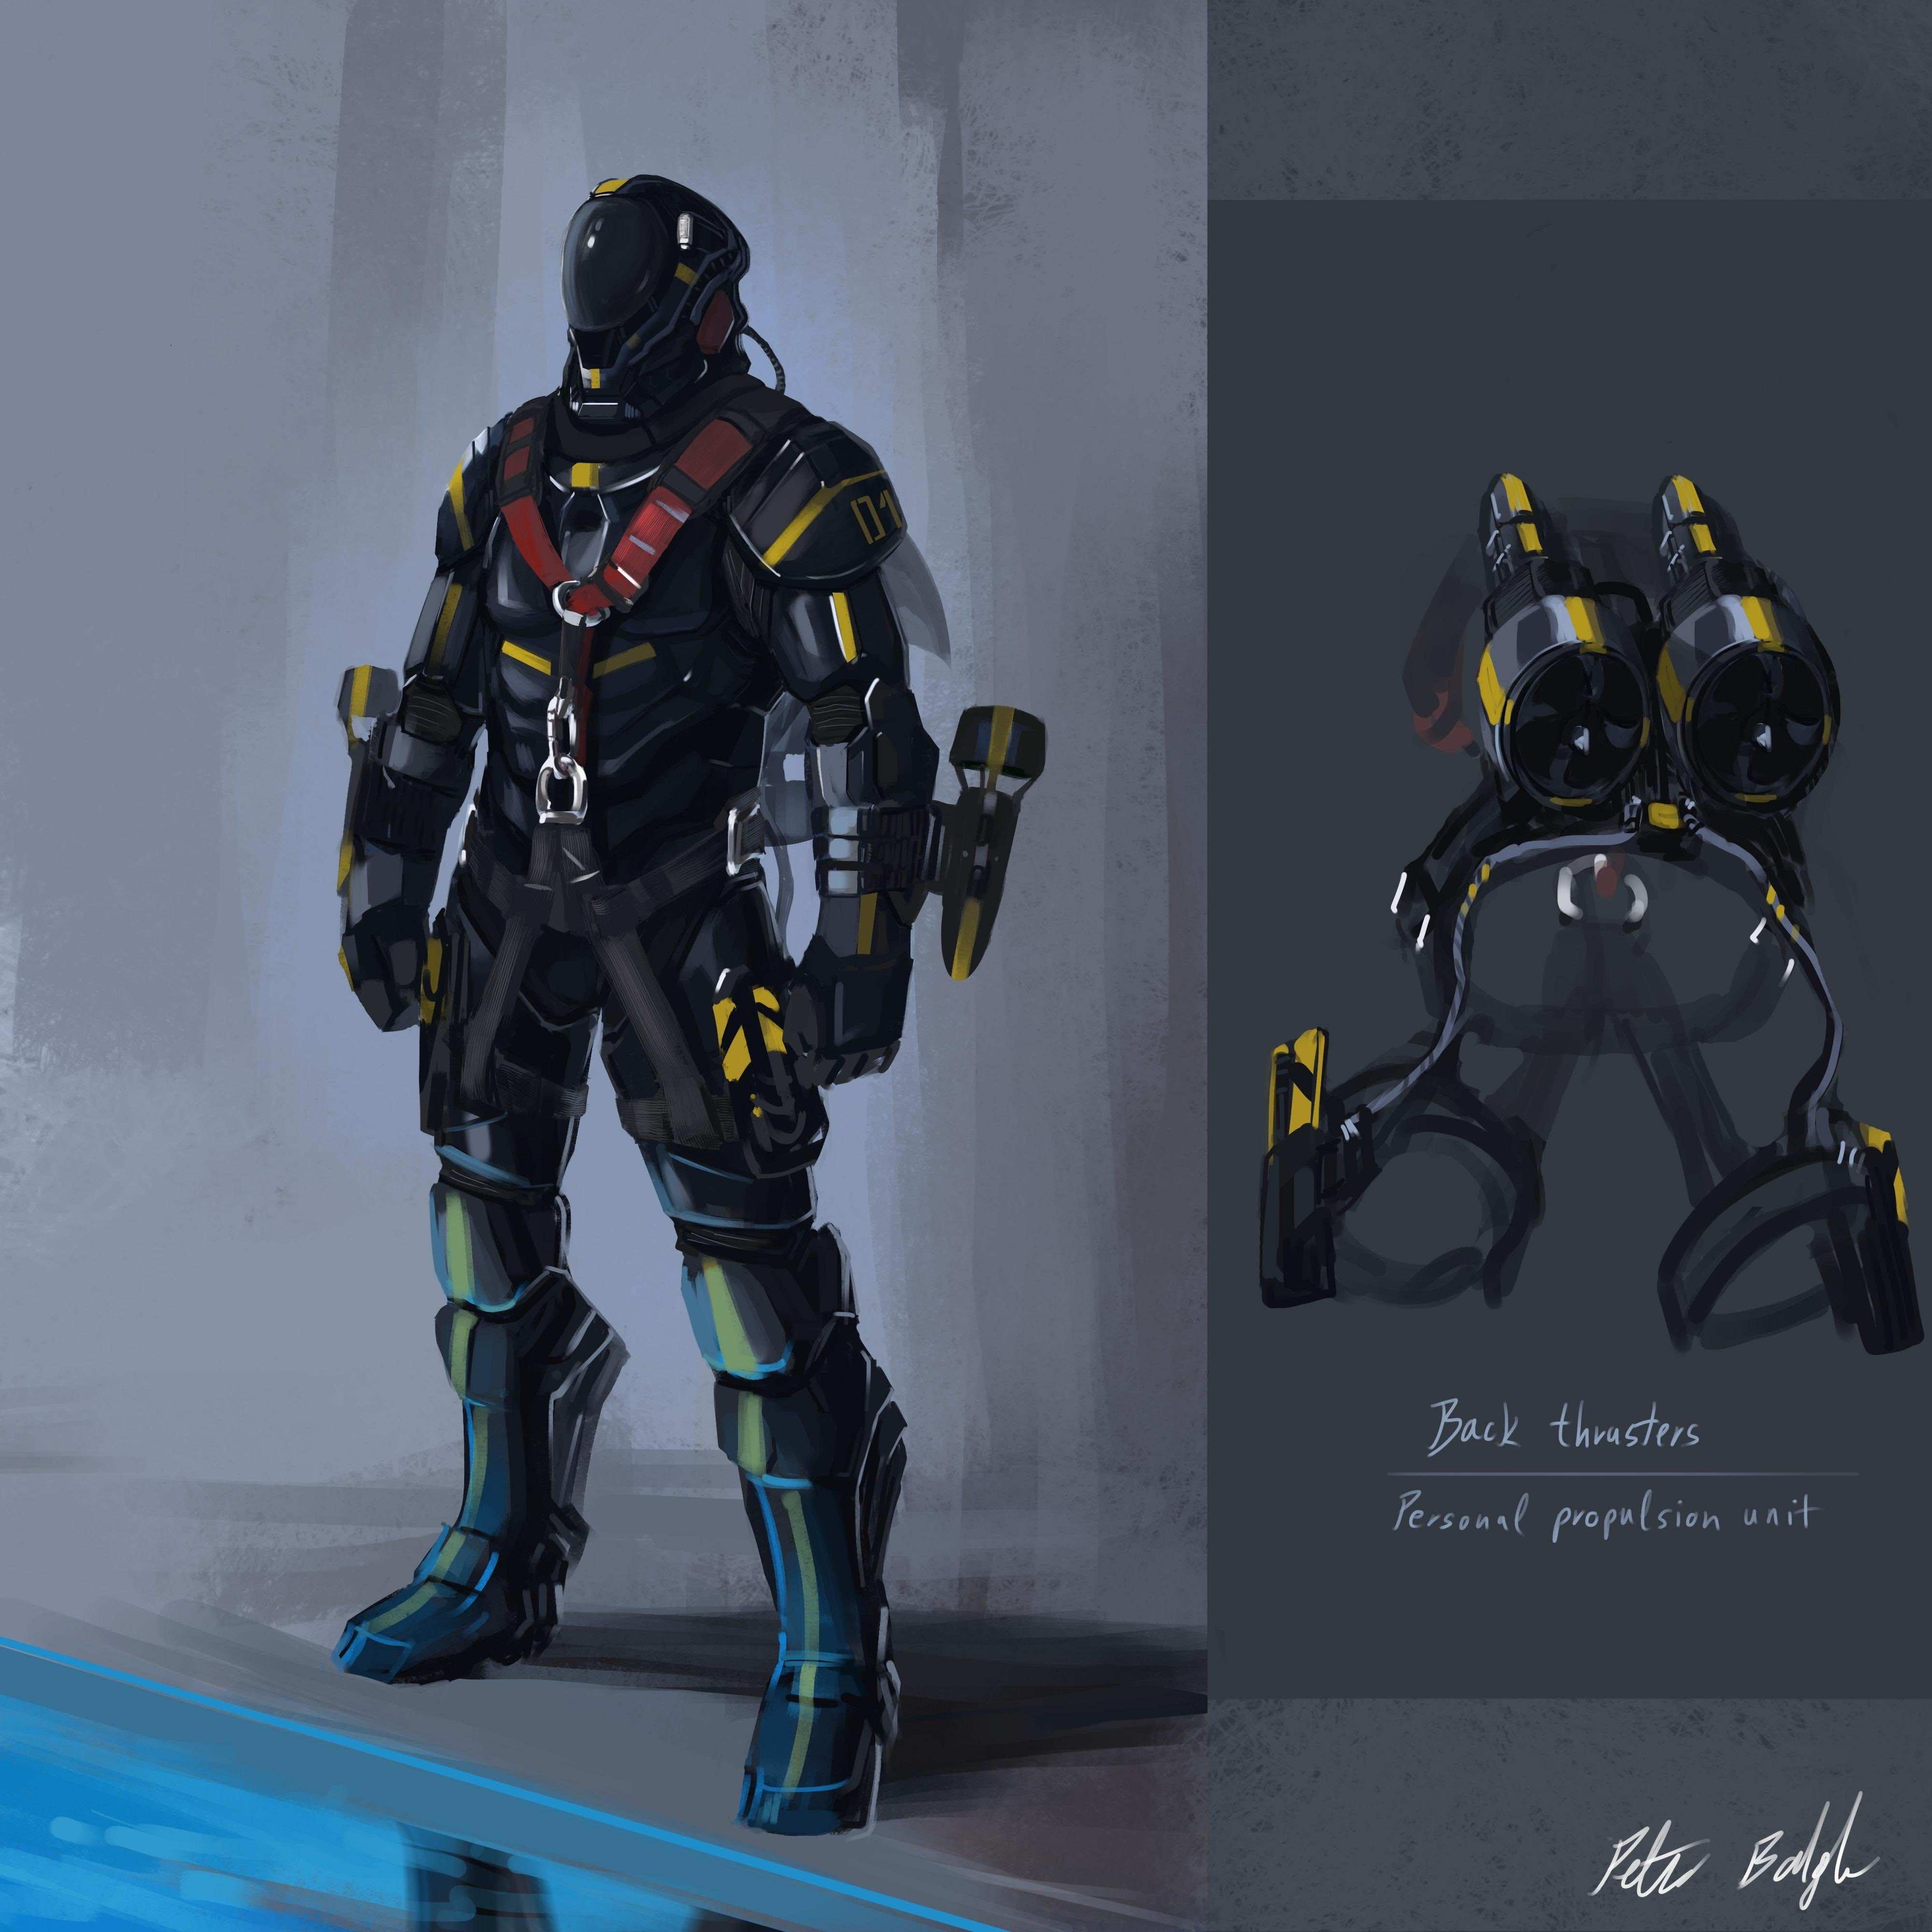 x2 Underwater Jet Pack Conceptual design